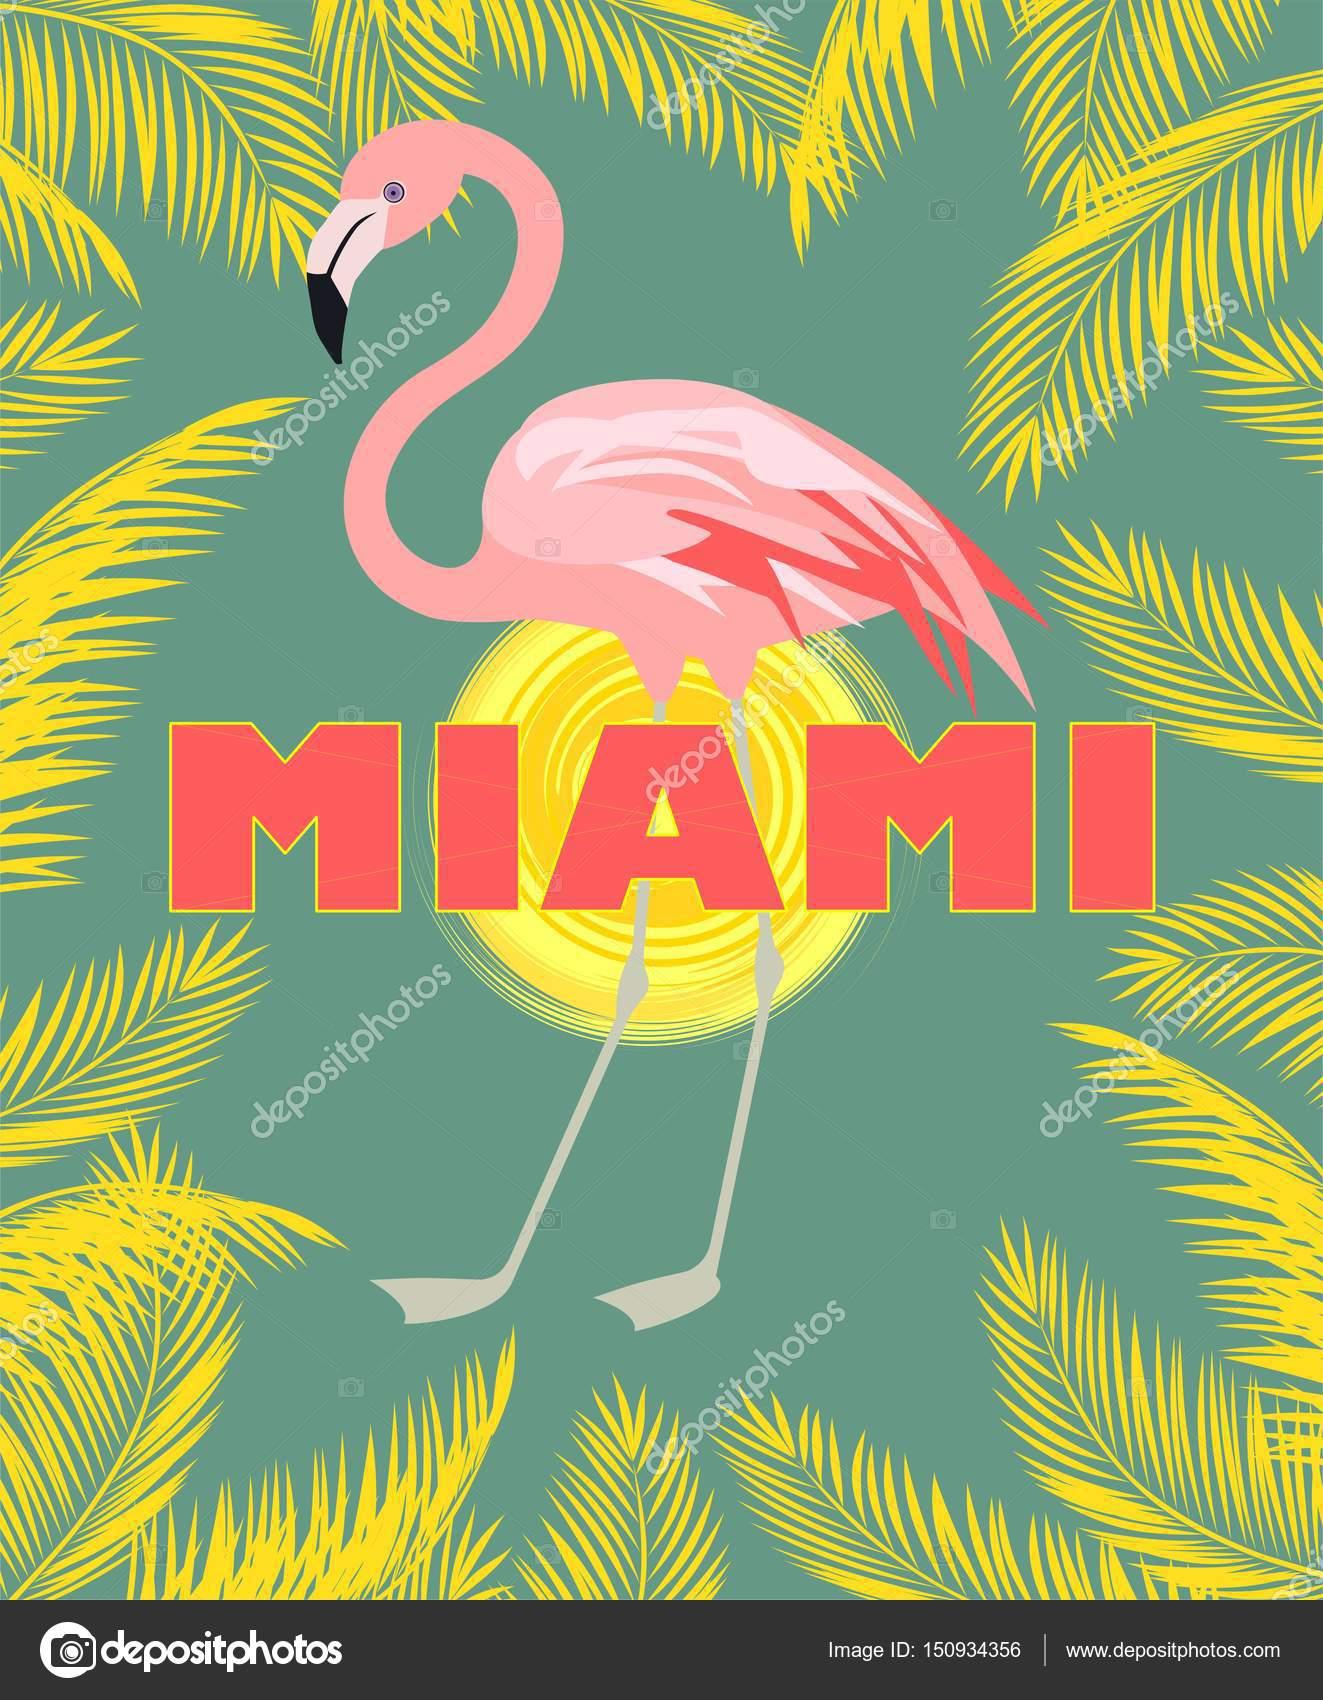 Flamingo art deco images galleries for Art deco artists list